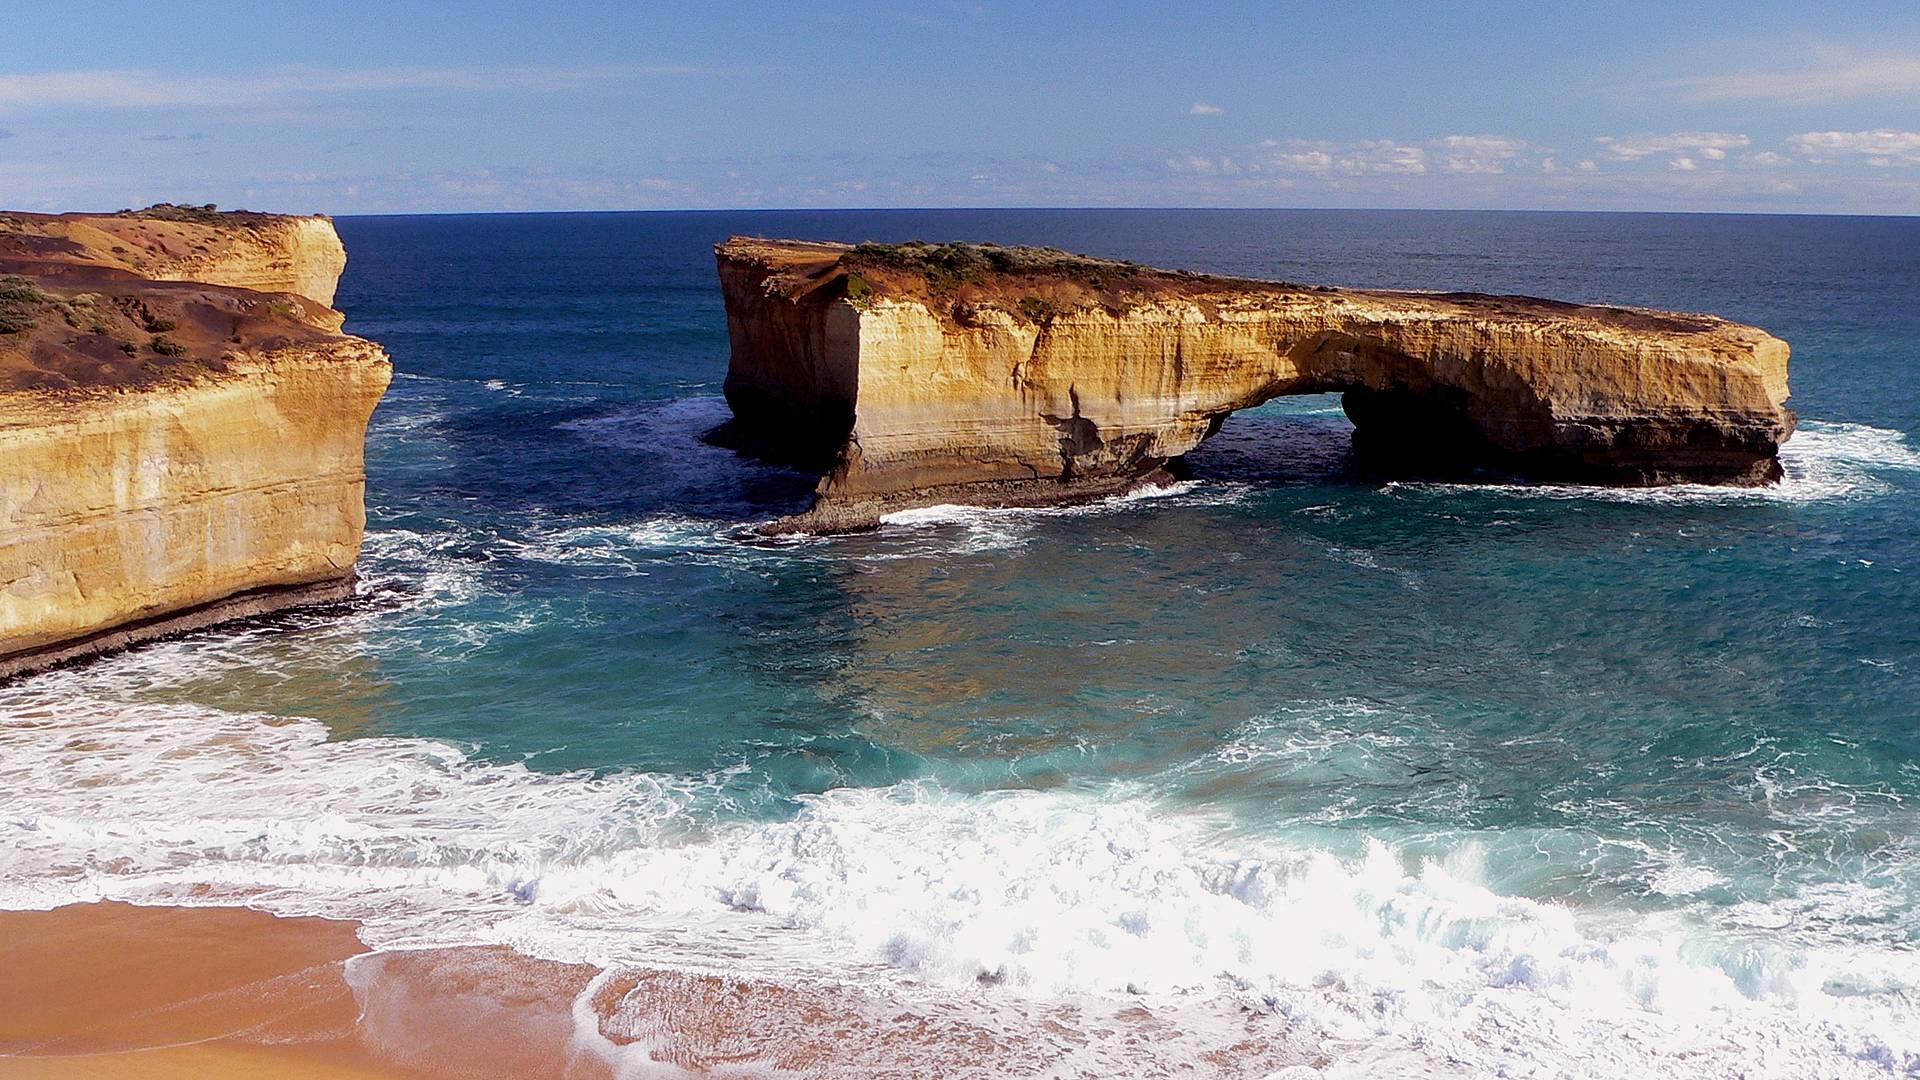 Dalle terre australiane alla Nuova Zelanda